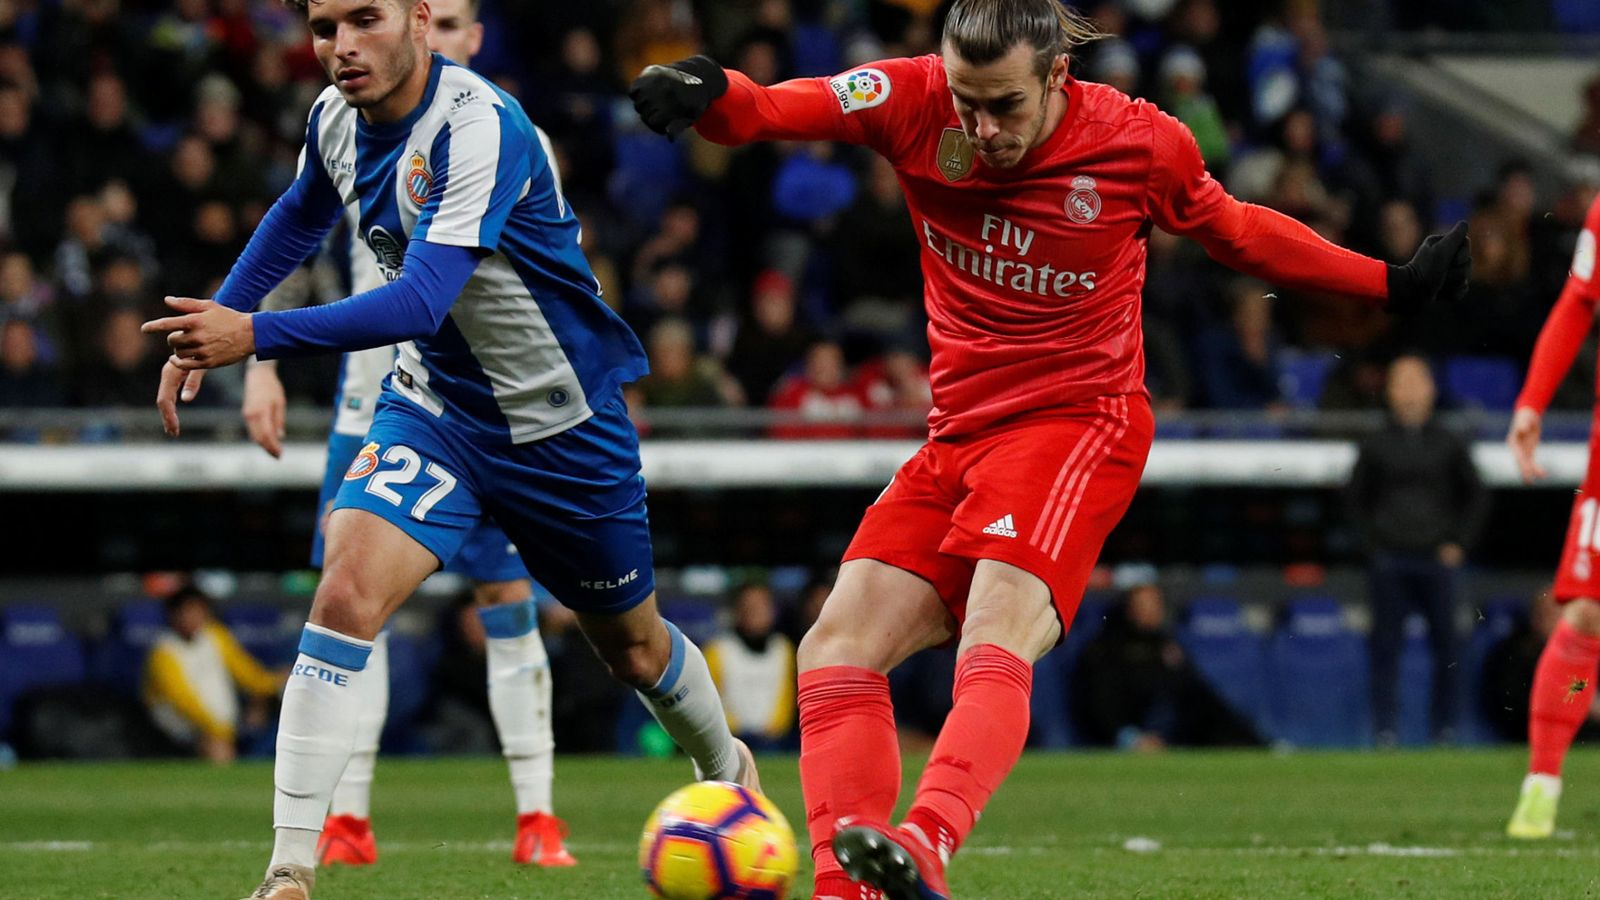 Foto: La liga santander - espanyol v real madrid